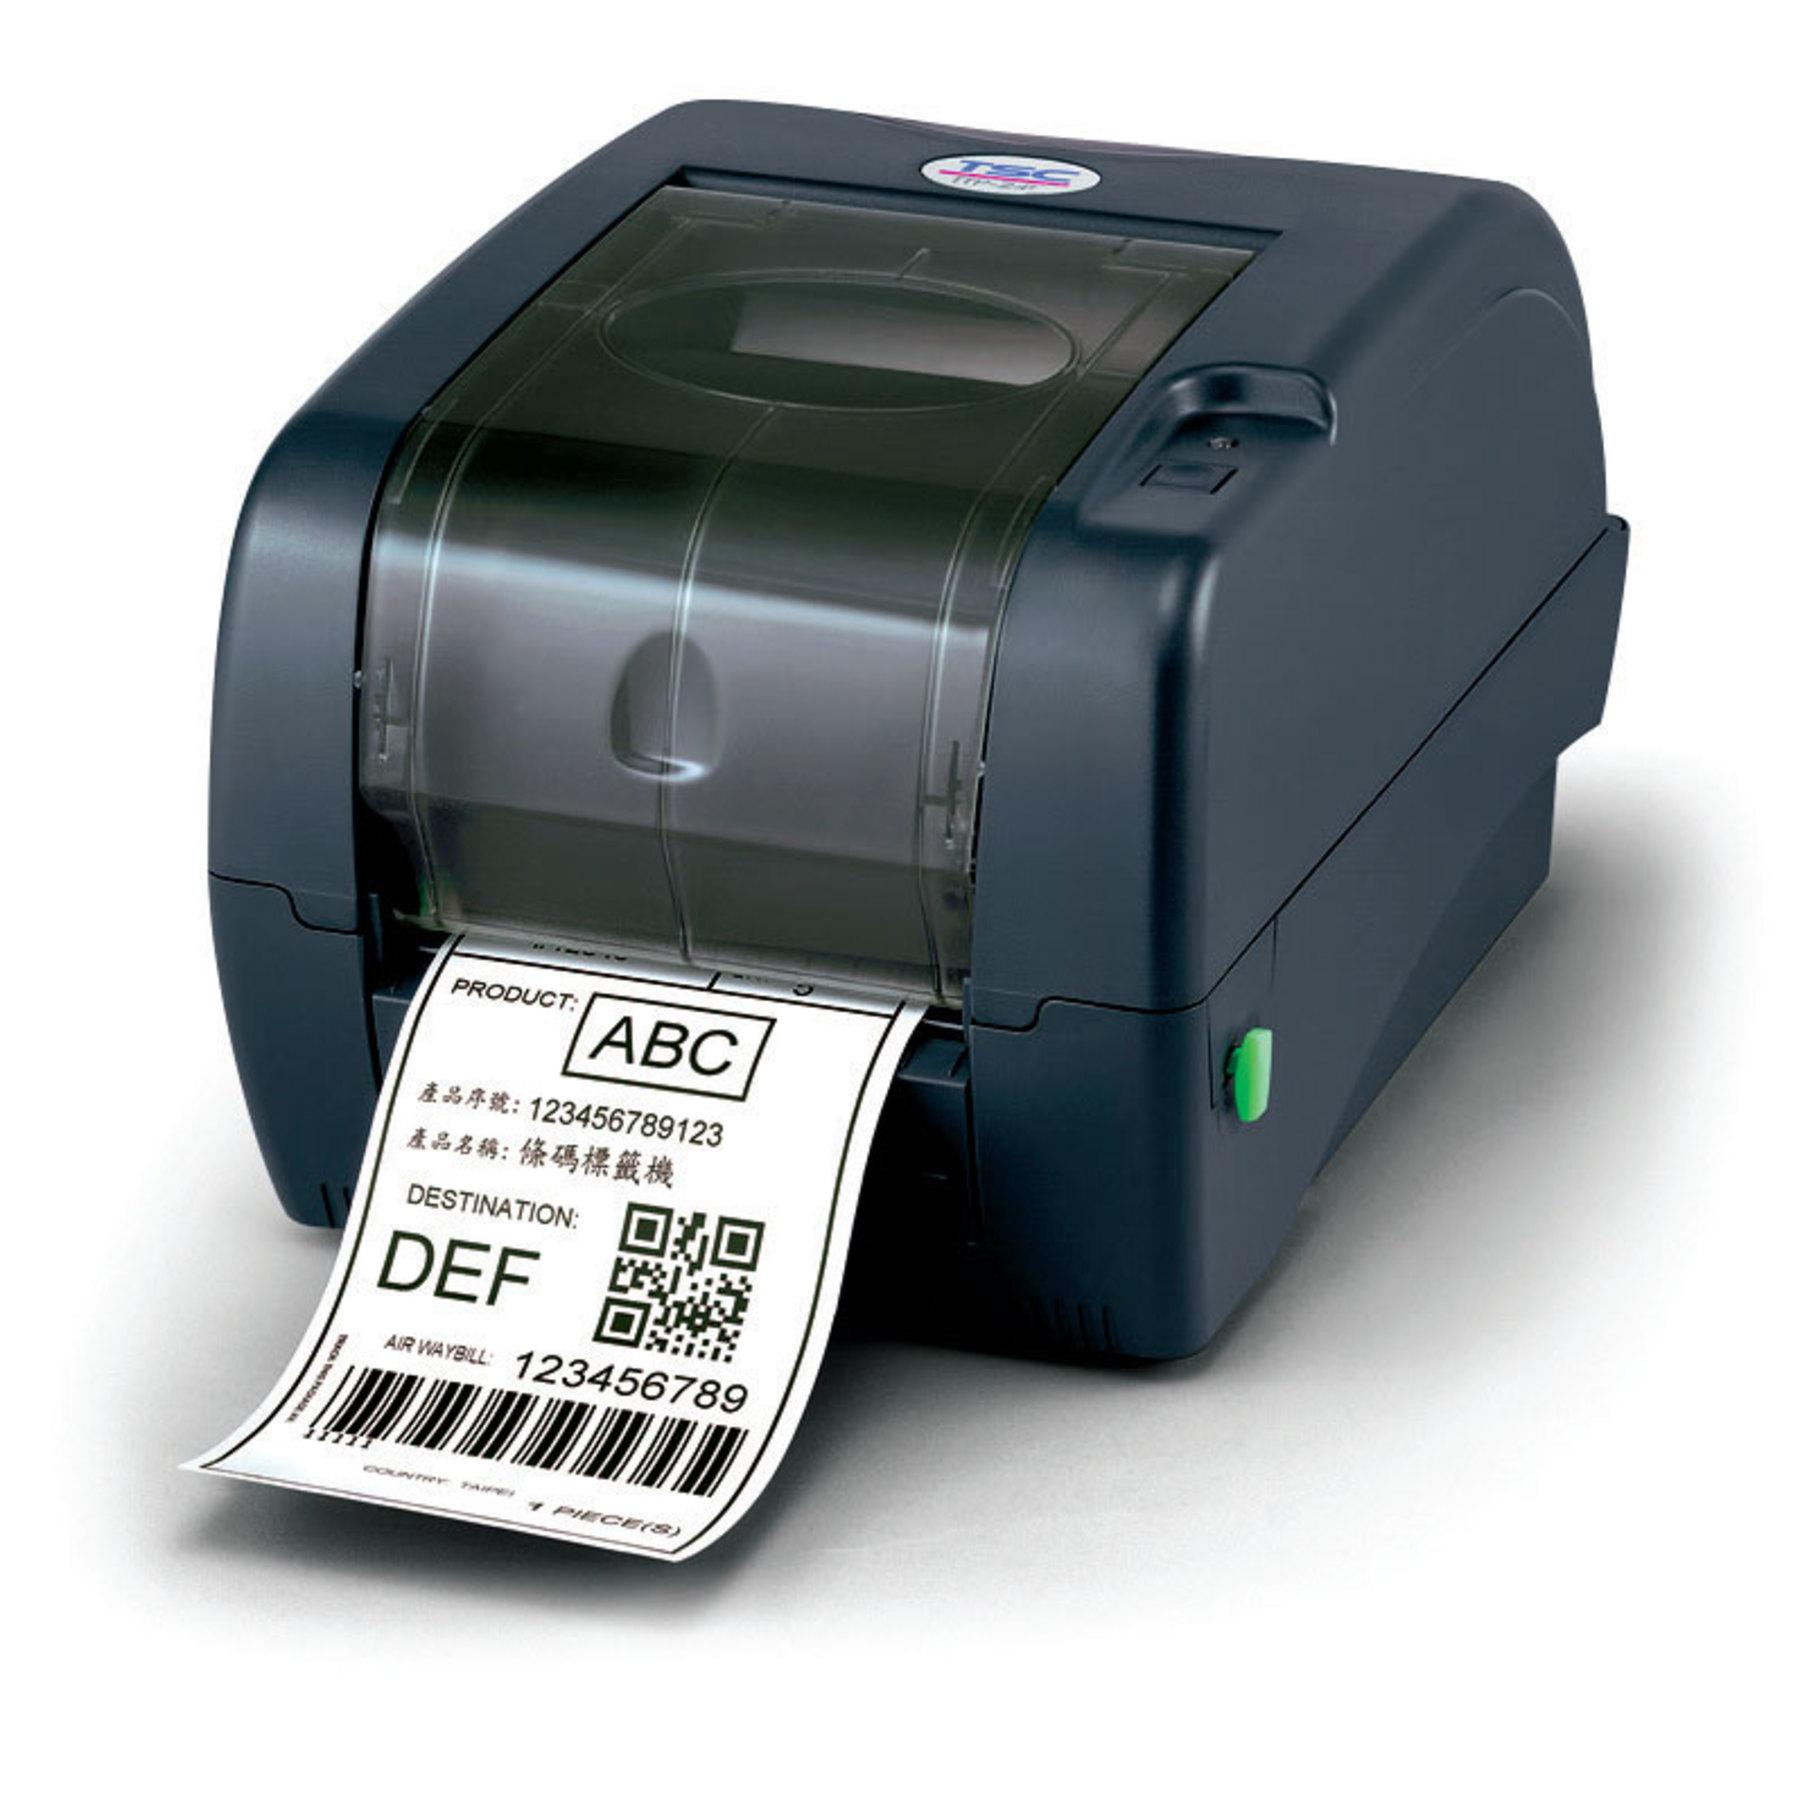 tsc ttp247 thermal transfer barcode label printer cash drawers ireland